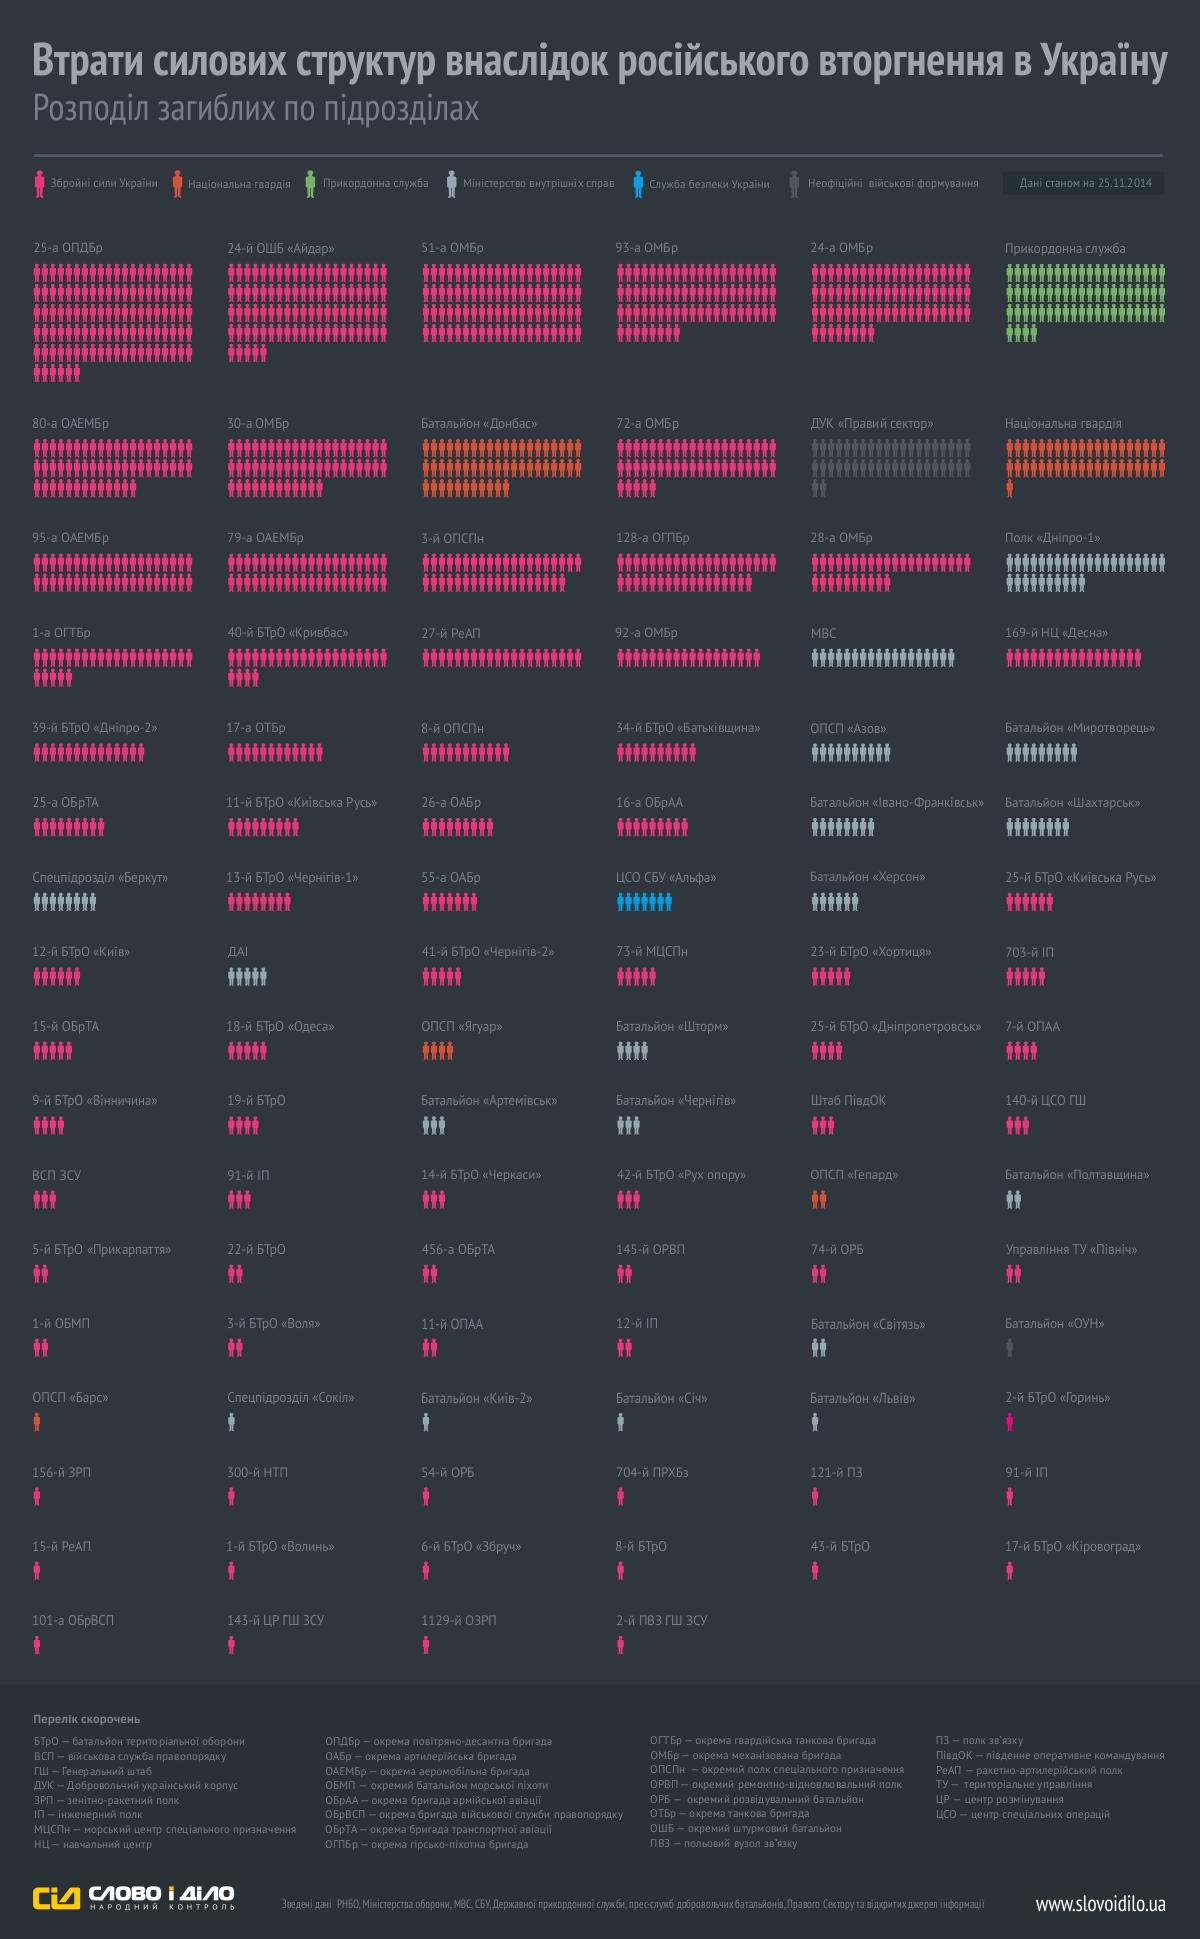 Потери сил АТО в войне за Донбасс по подразделениям: инфографика